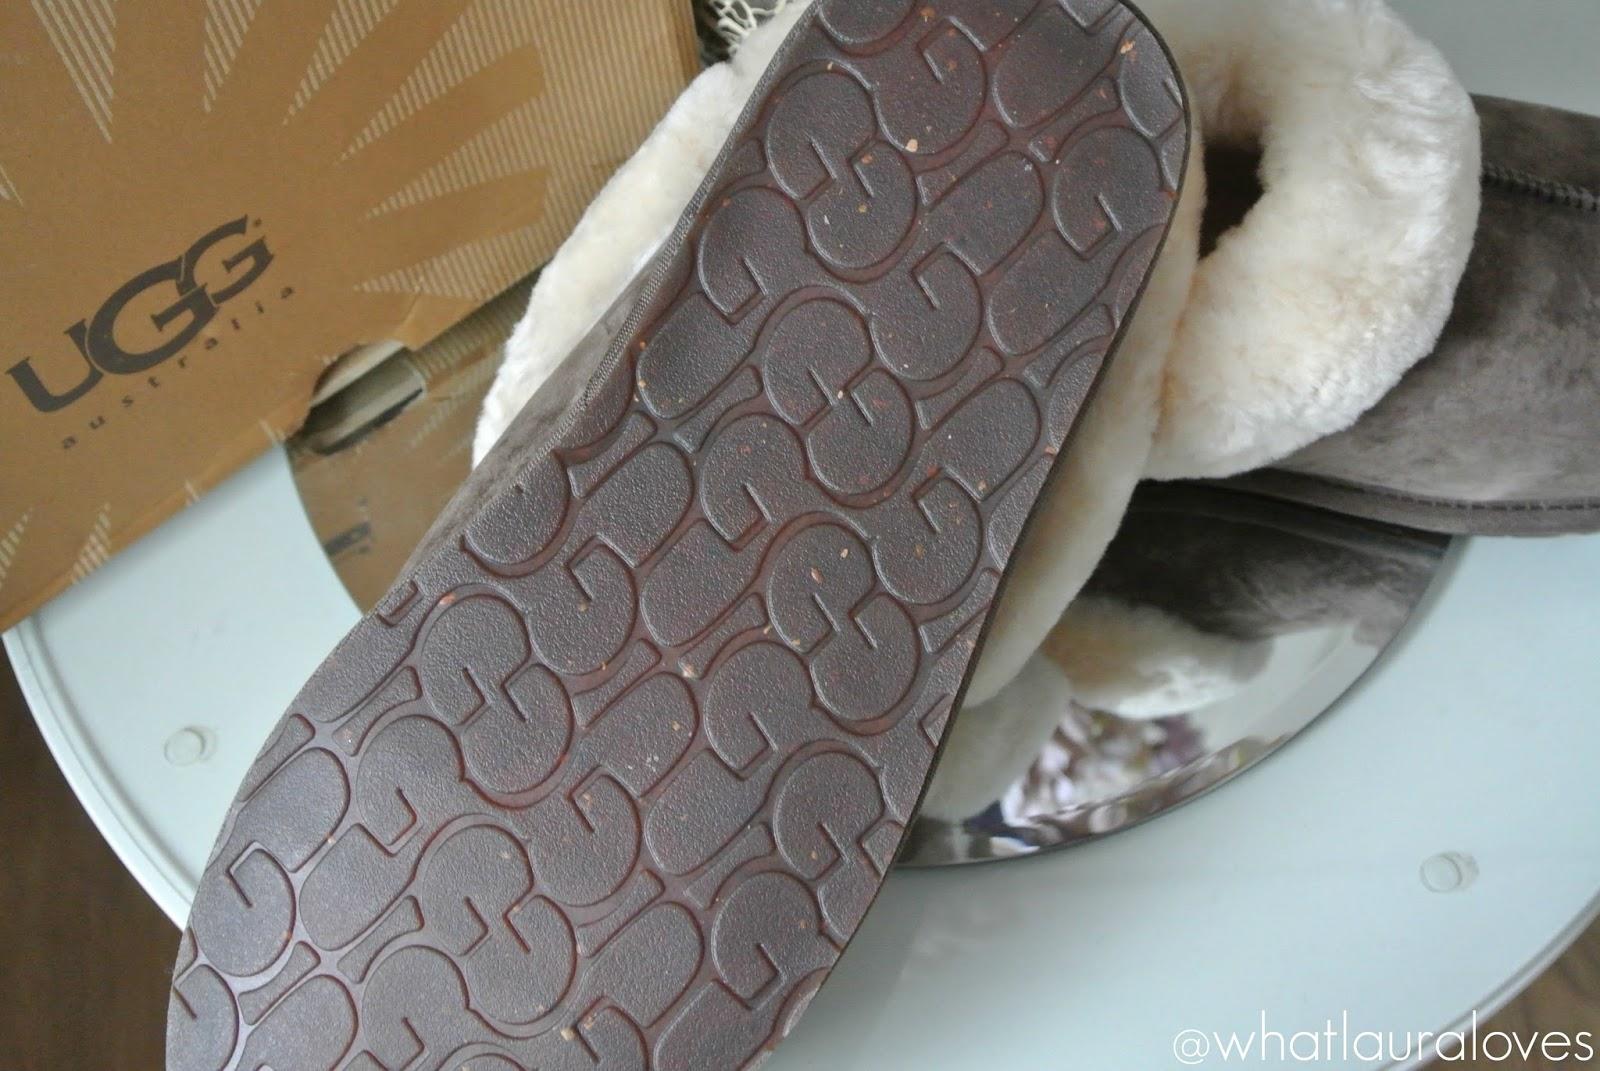 Cloggs UGG Australia Moraene Slippers in Espresso